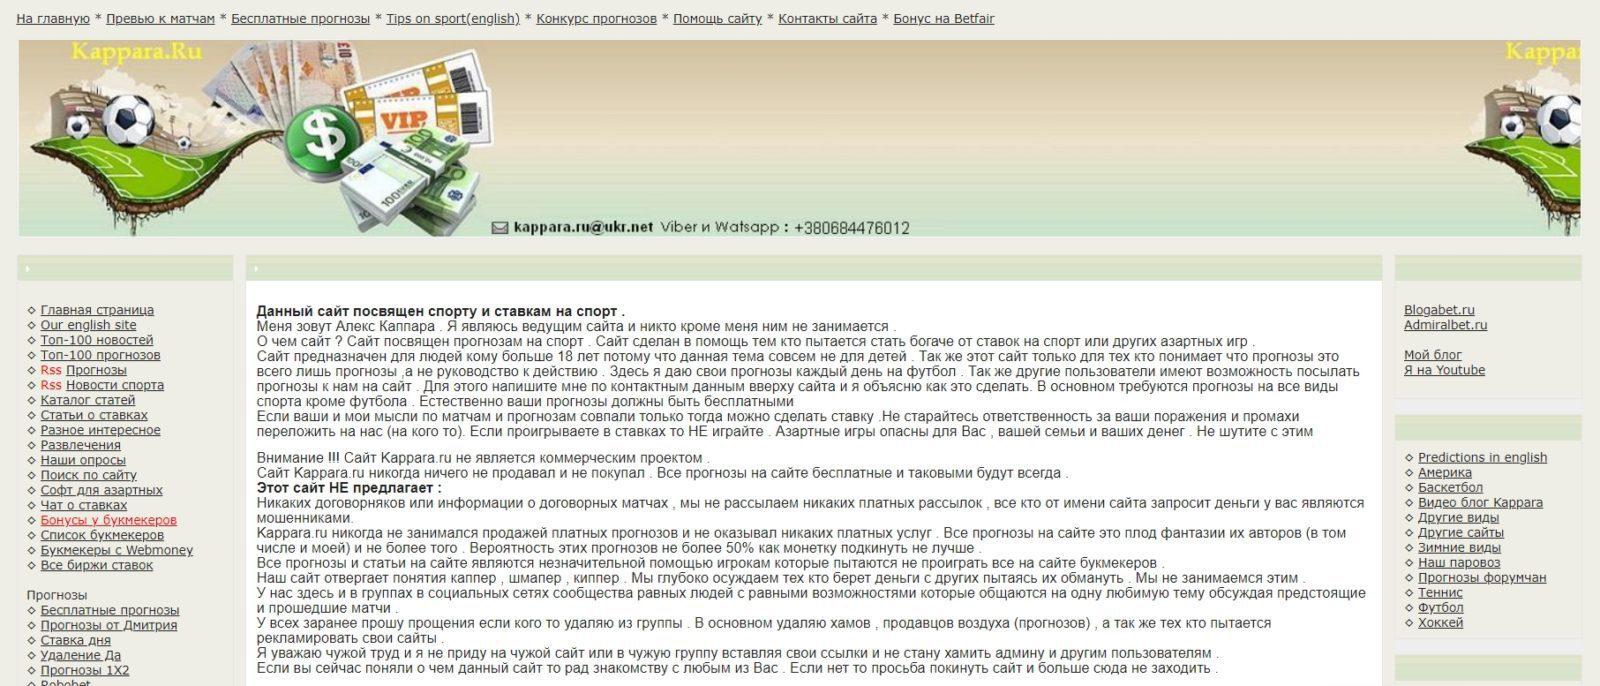 Главная страница сайта Kappara.ru (Каппара)